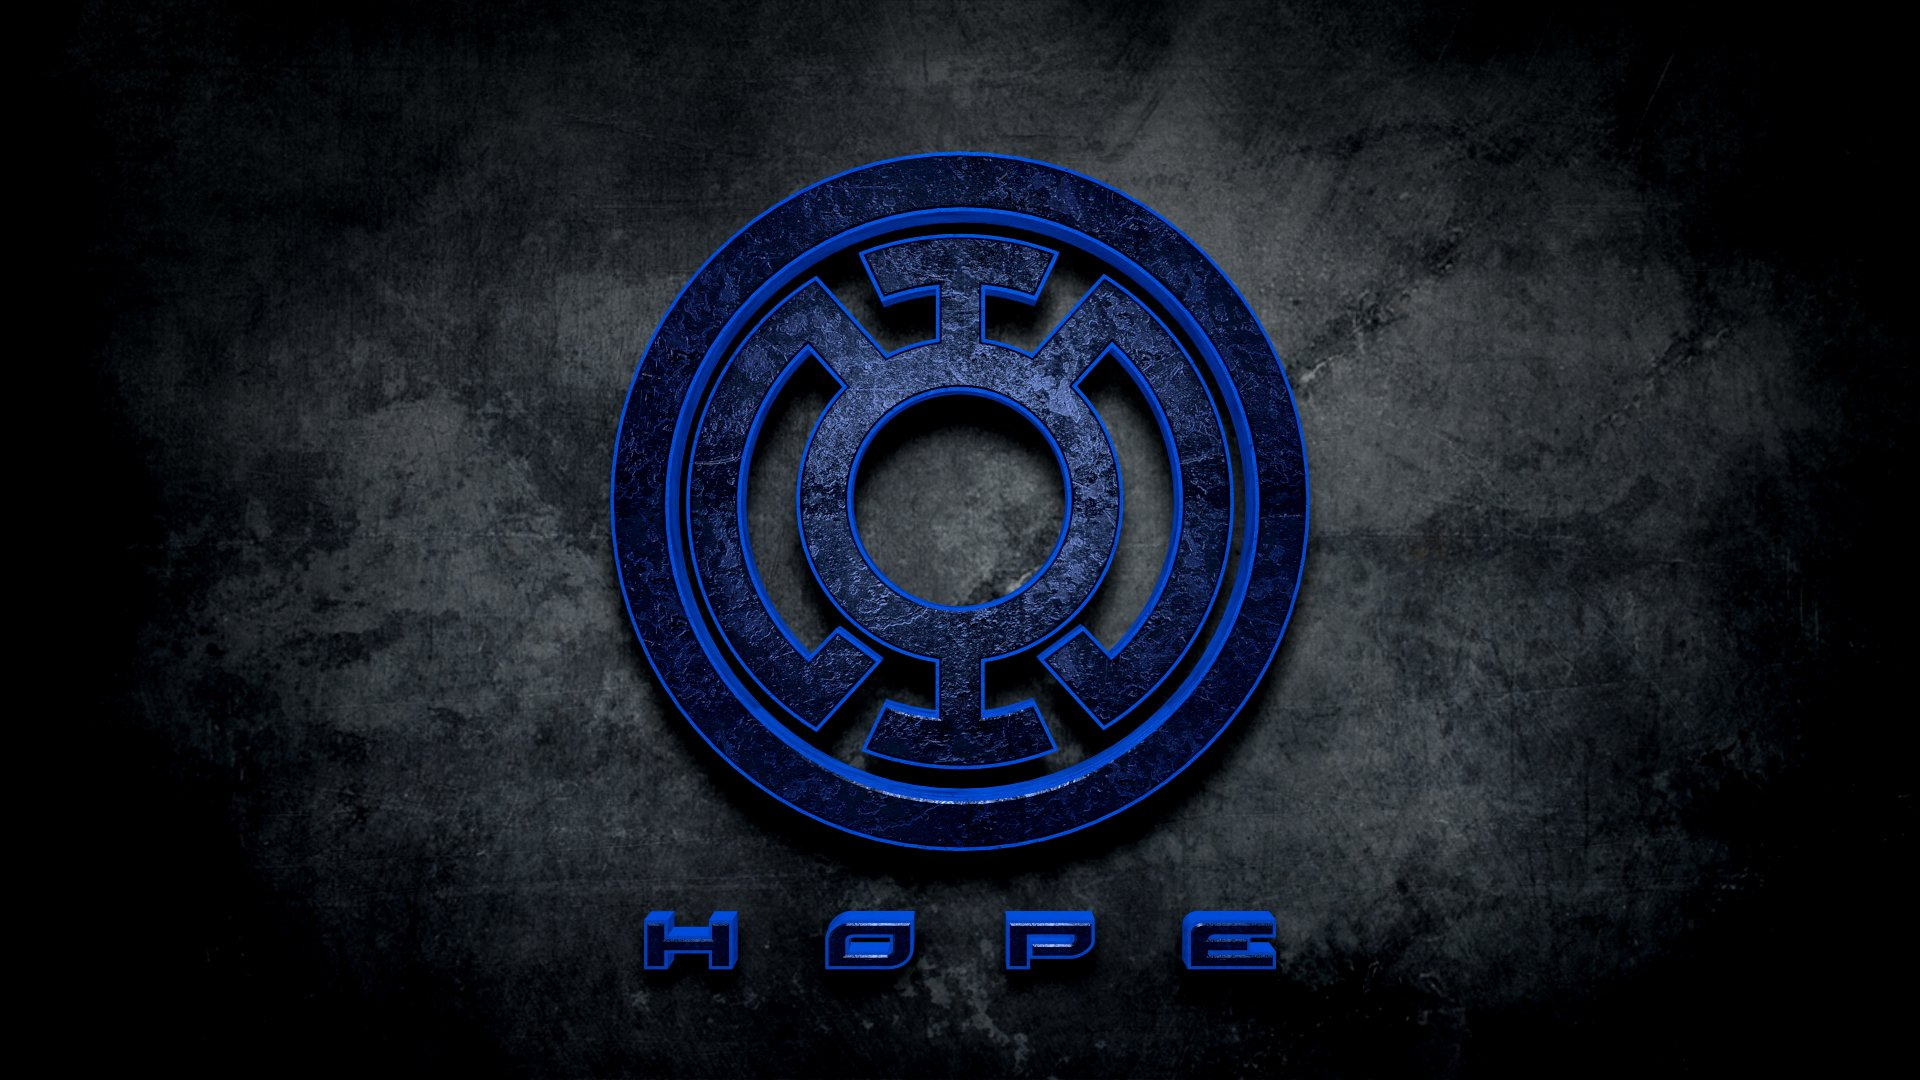 Blue Lantern Corps Hd Wallpaper Background Image 1920x1080 Id